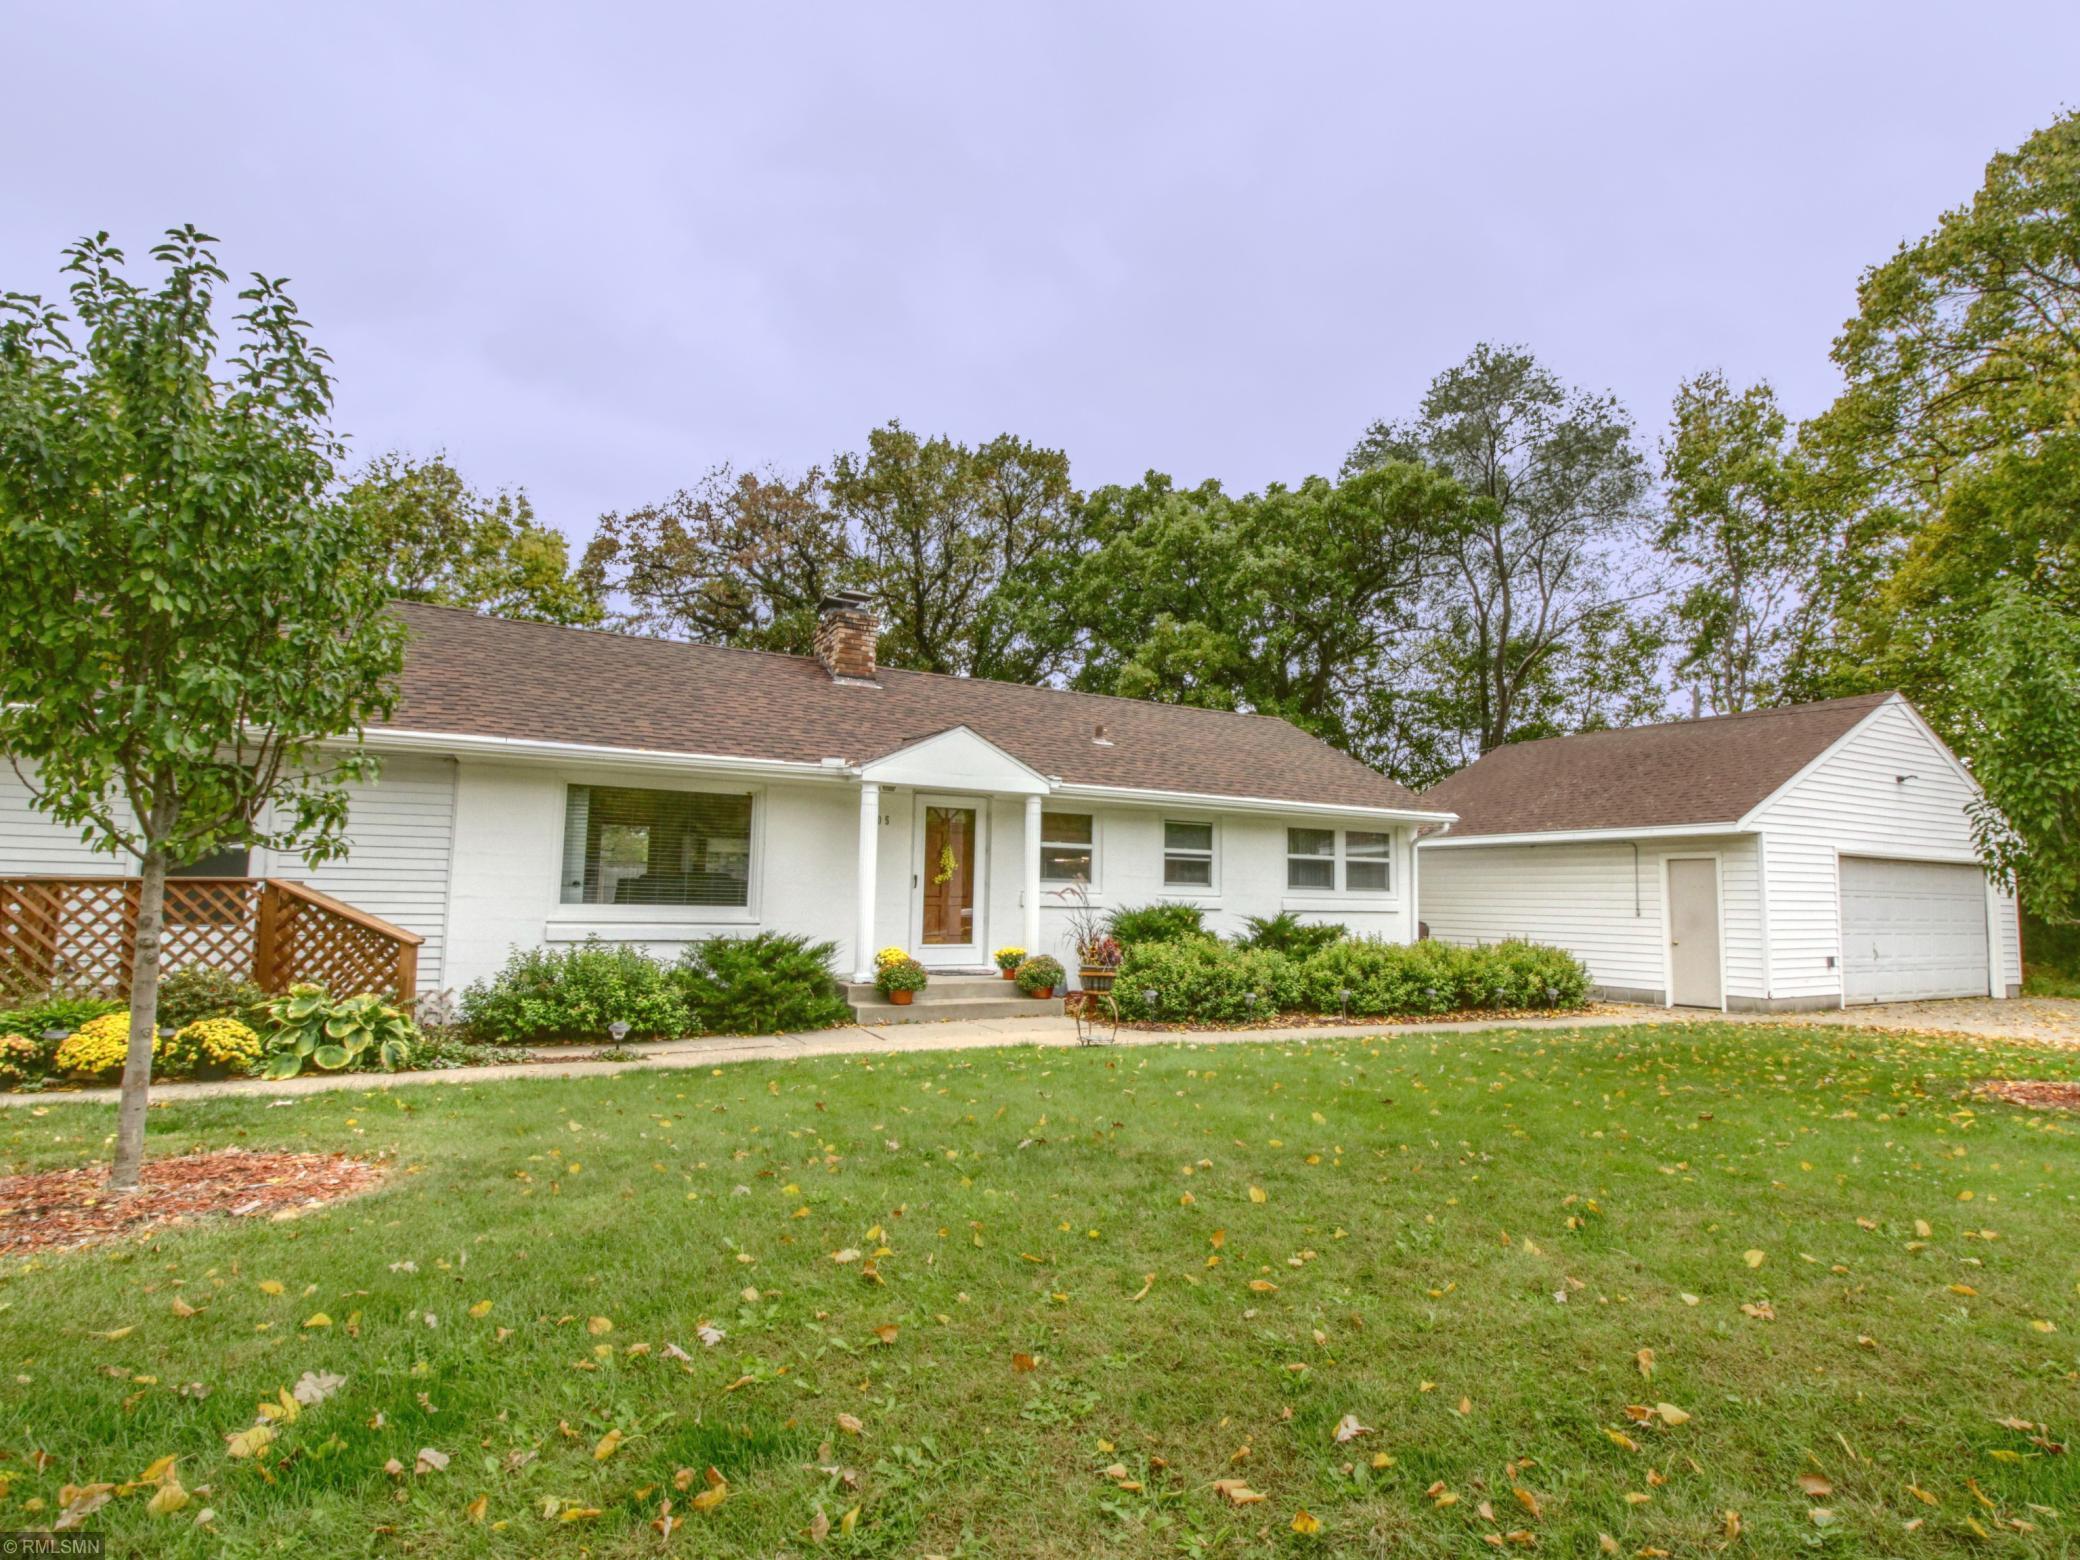 2105 Glenview Lane Property Photo - Bloomington, MN real estate listing